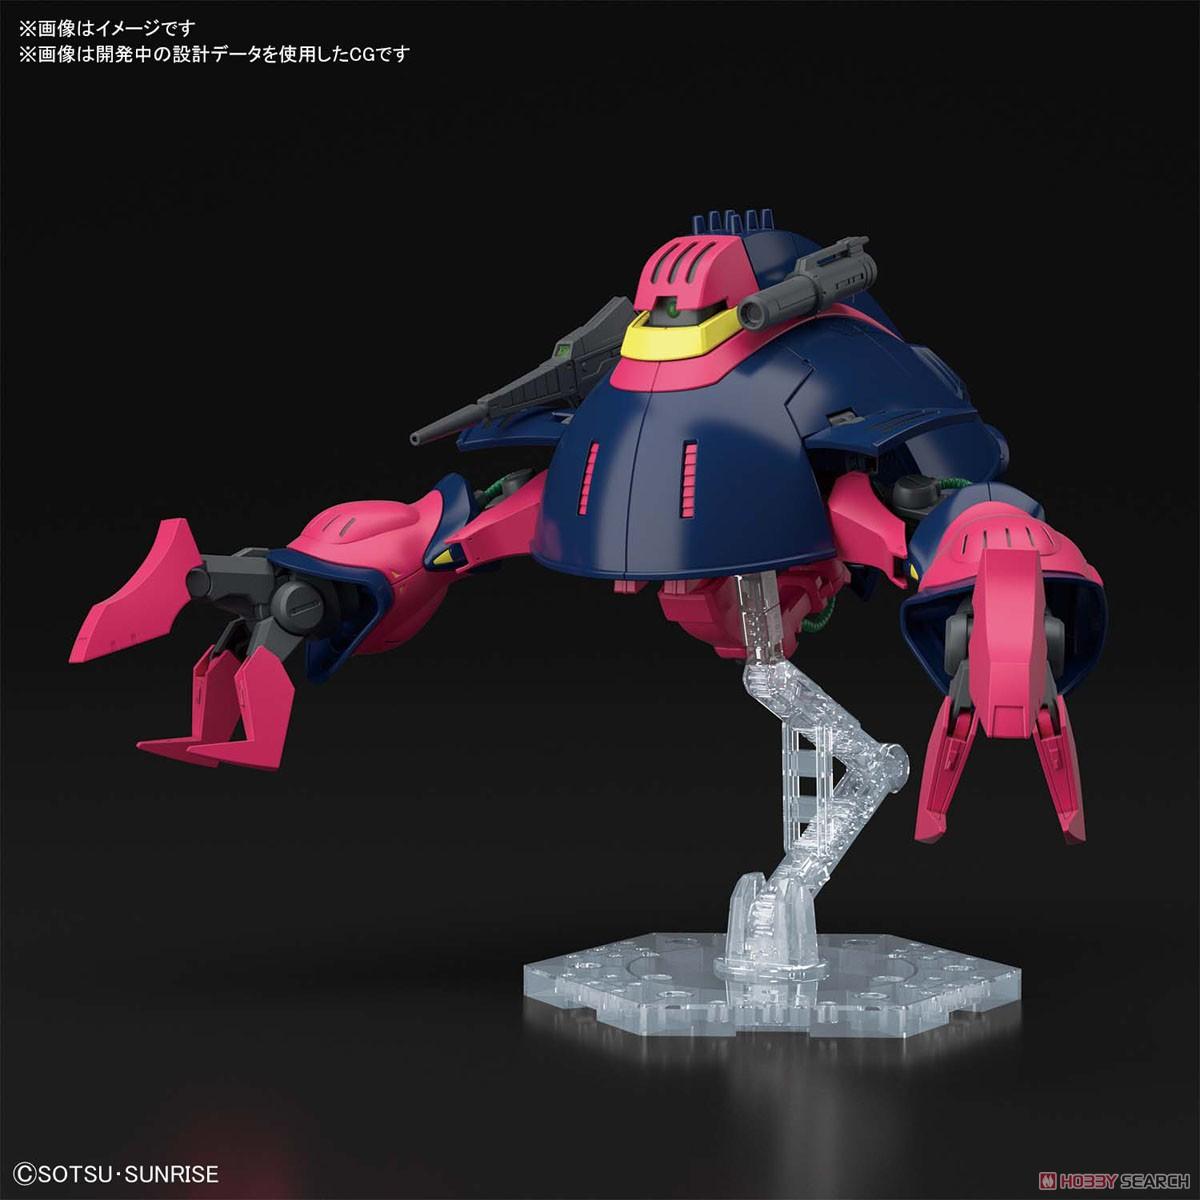 HGUC 1/144『バウンド・ドック』機動戦士Zガンダム プラモデル-013